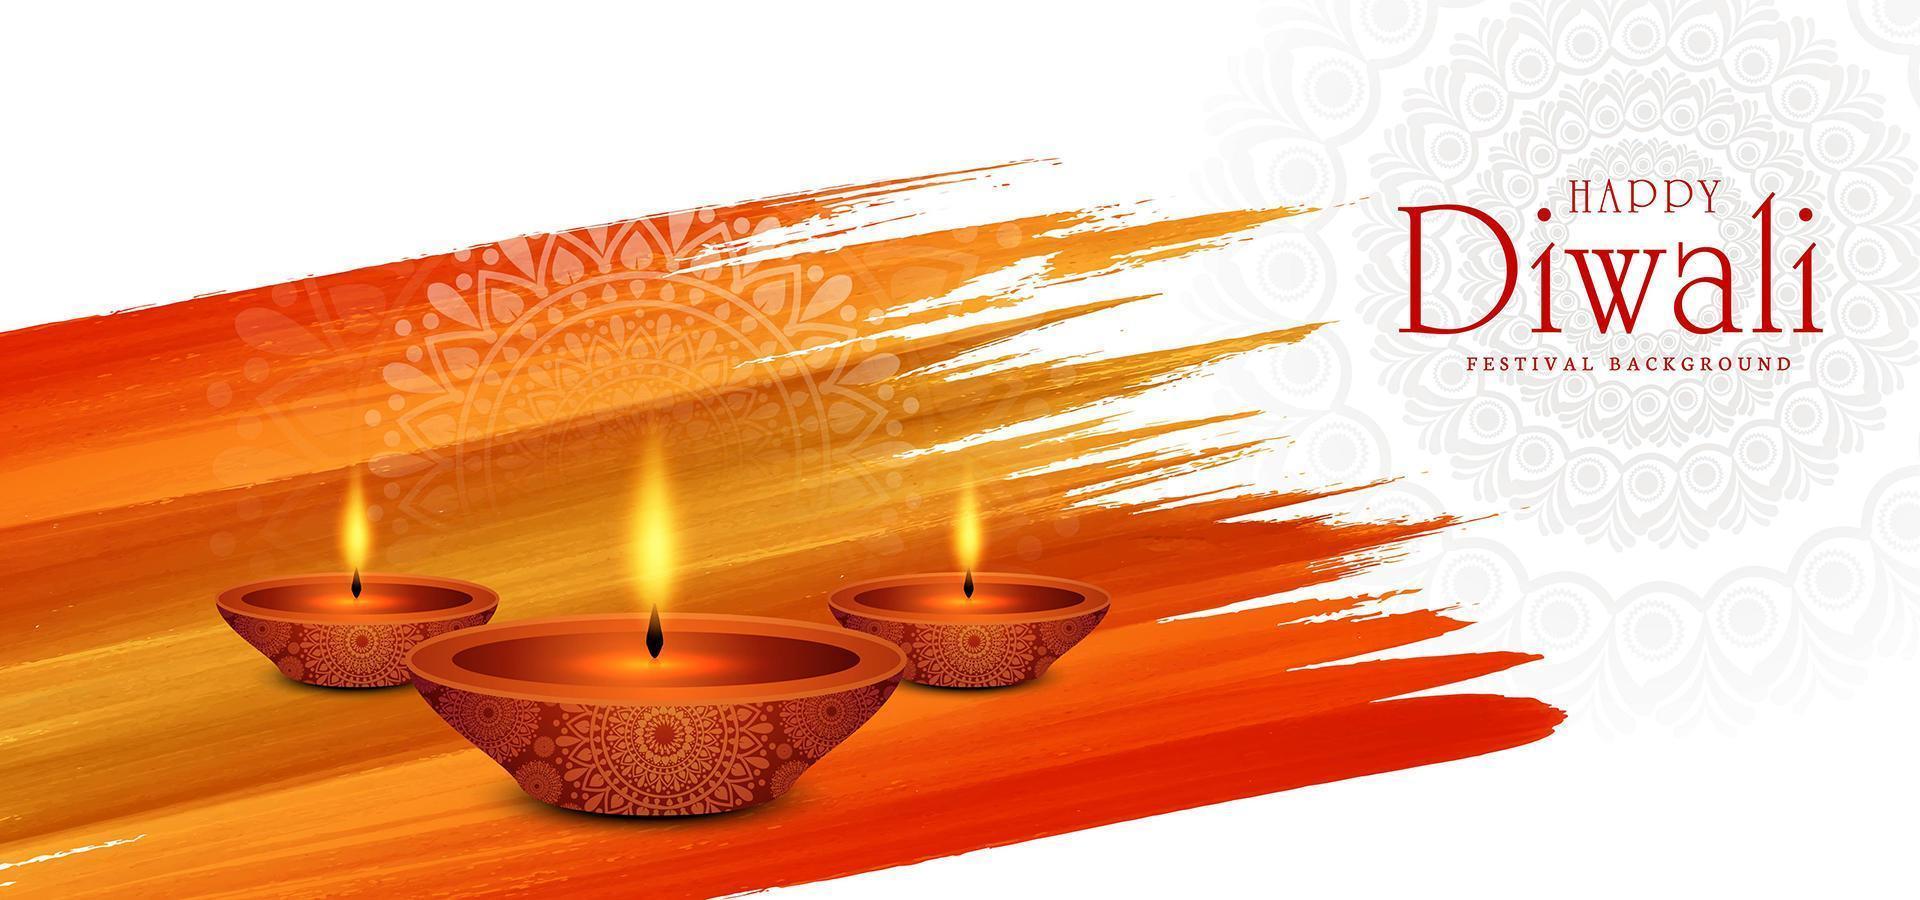 fondo de festival de diwali de lámpara iluminada iluminada creativa vector